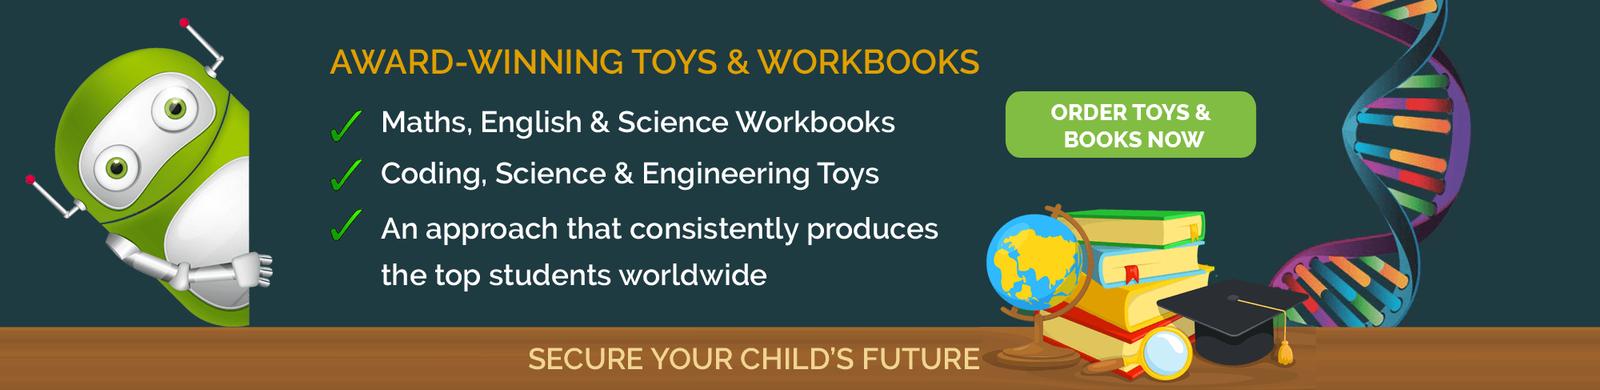 TheBalancedChild STEM Toys & Books